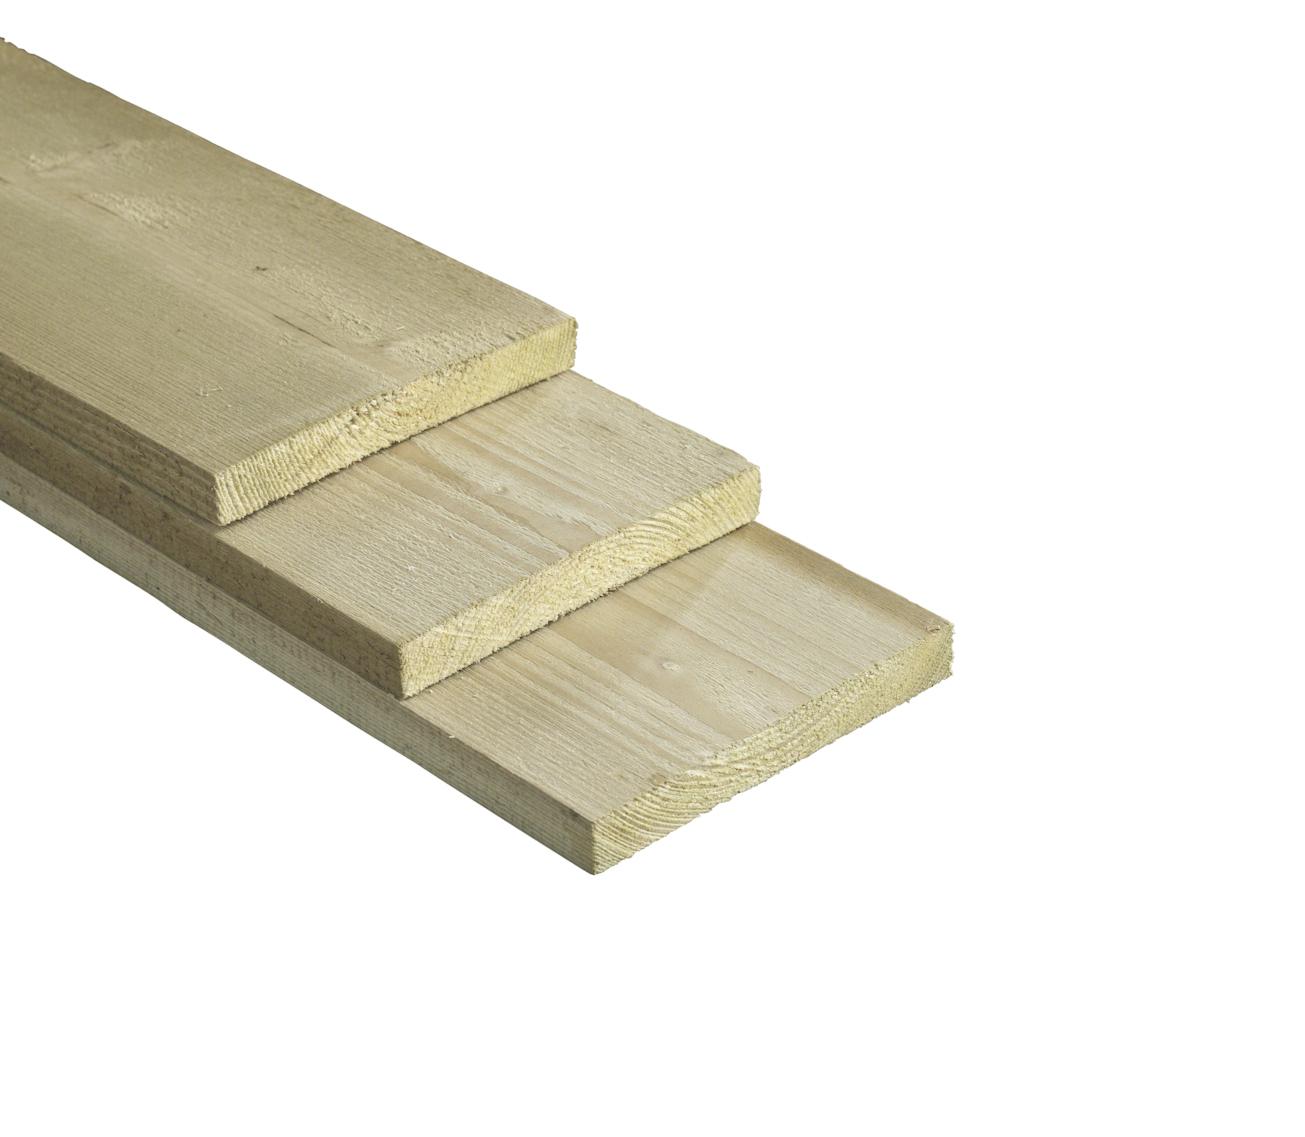 Wandplank 60 Cm Breed.Fijnbezaagde Plank Naaldhout Geimpregneerd 2 Cm Dik